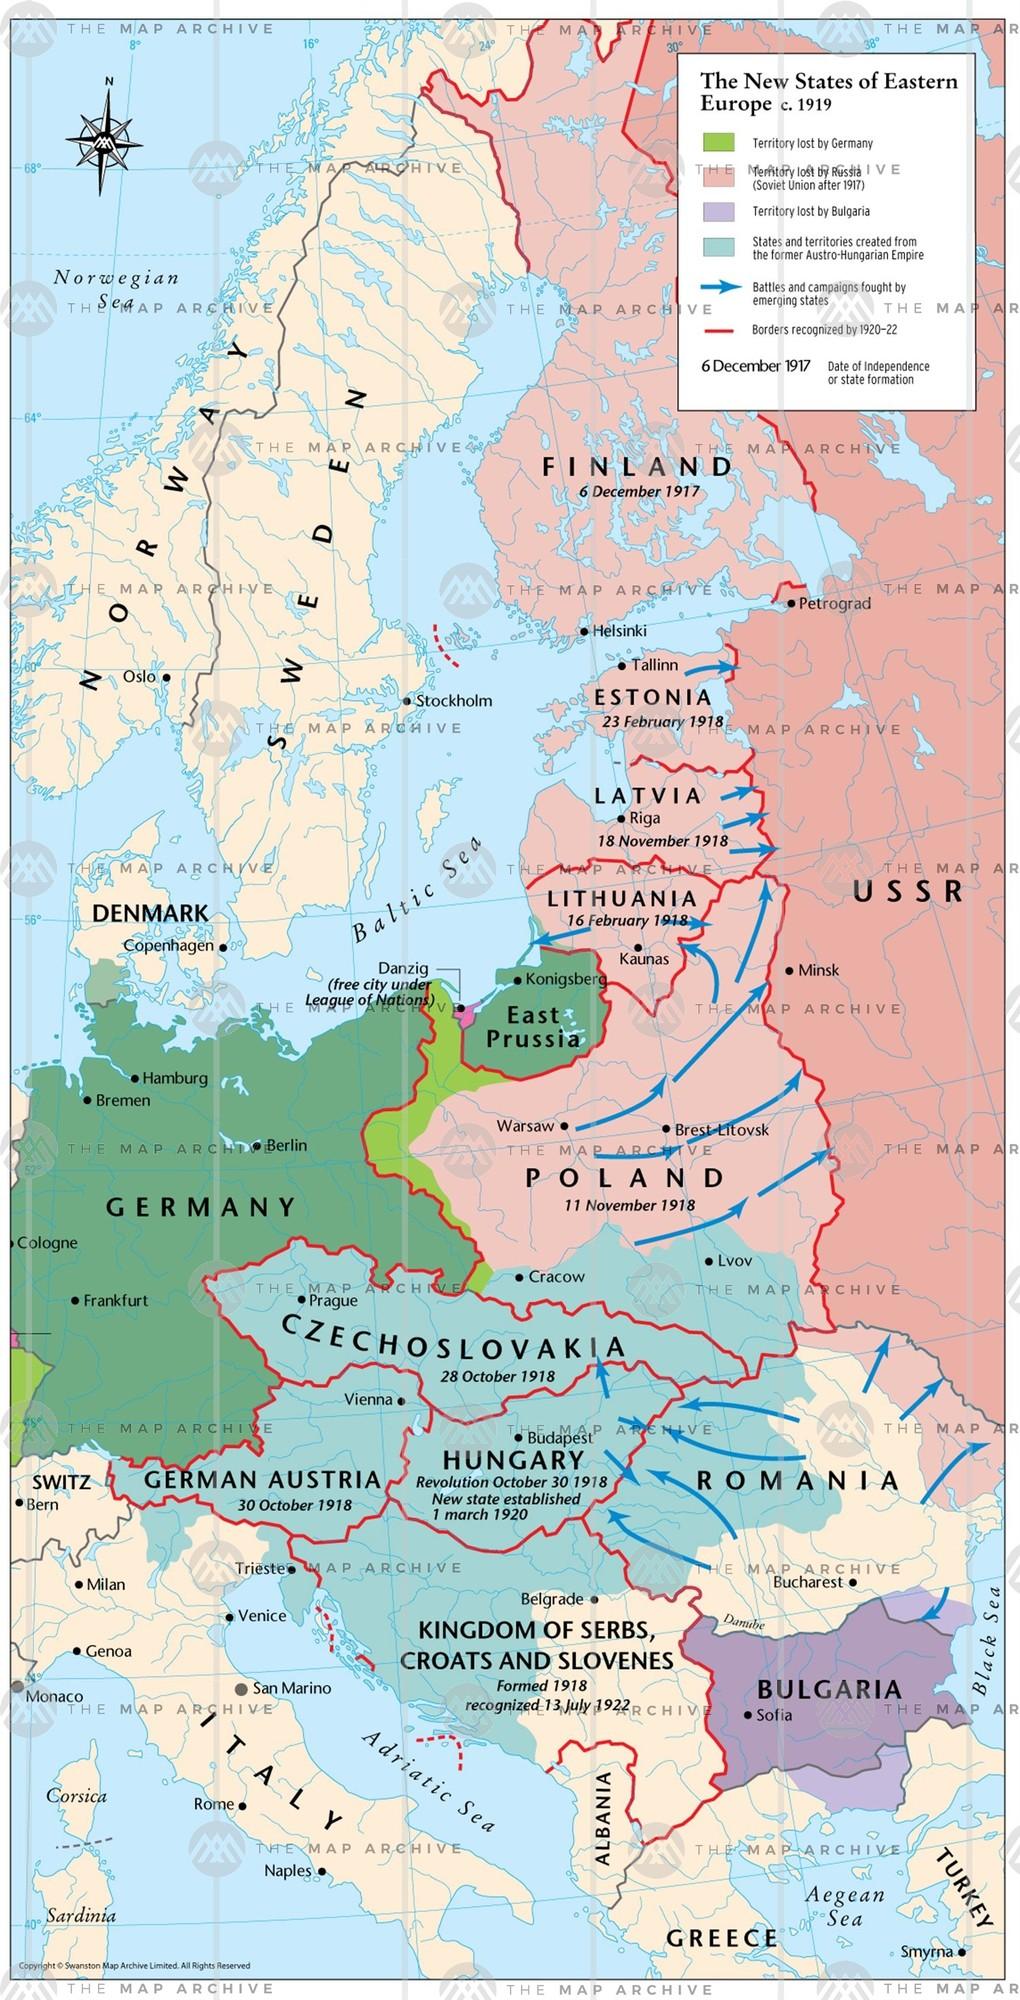 Eastern Europe in 1919